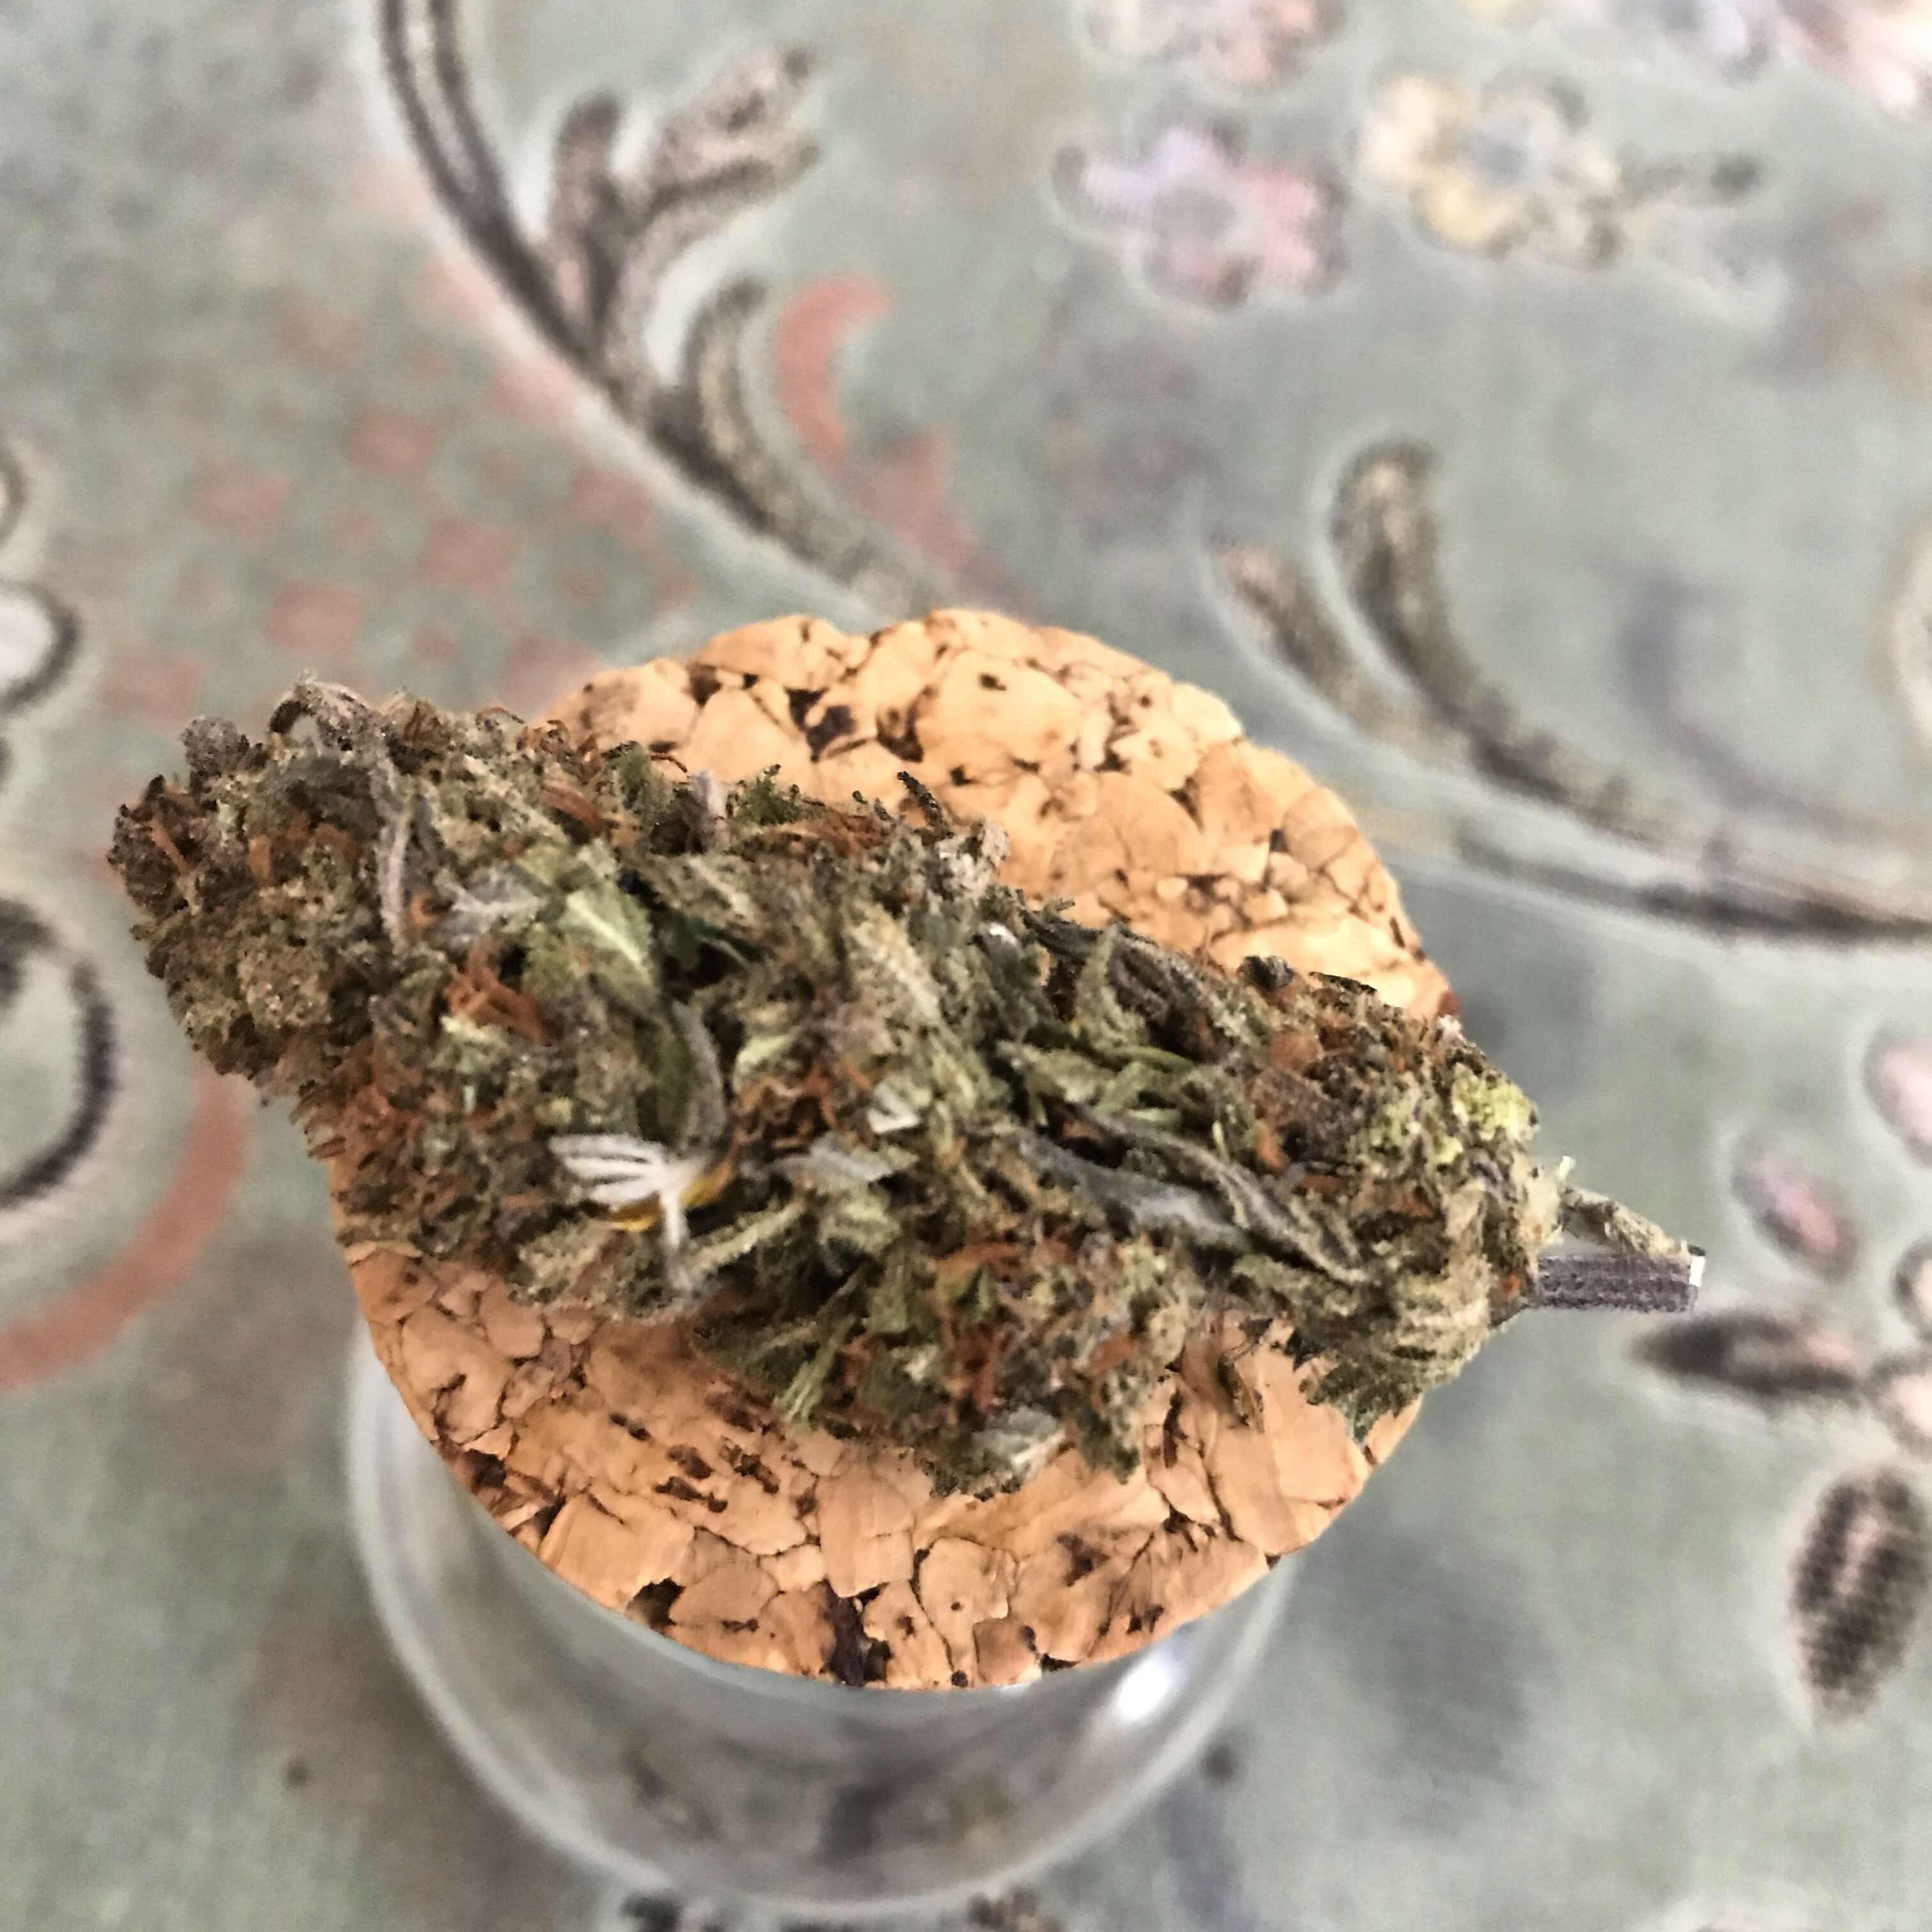 CBD Flower Strain Review: Granddaddy Purple CBD (12.3% CBD) from Kingdom of Green